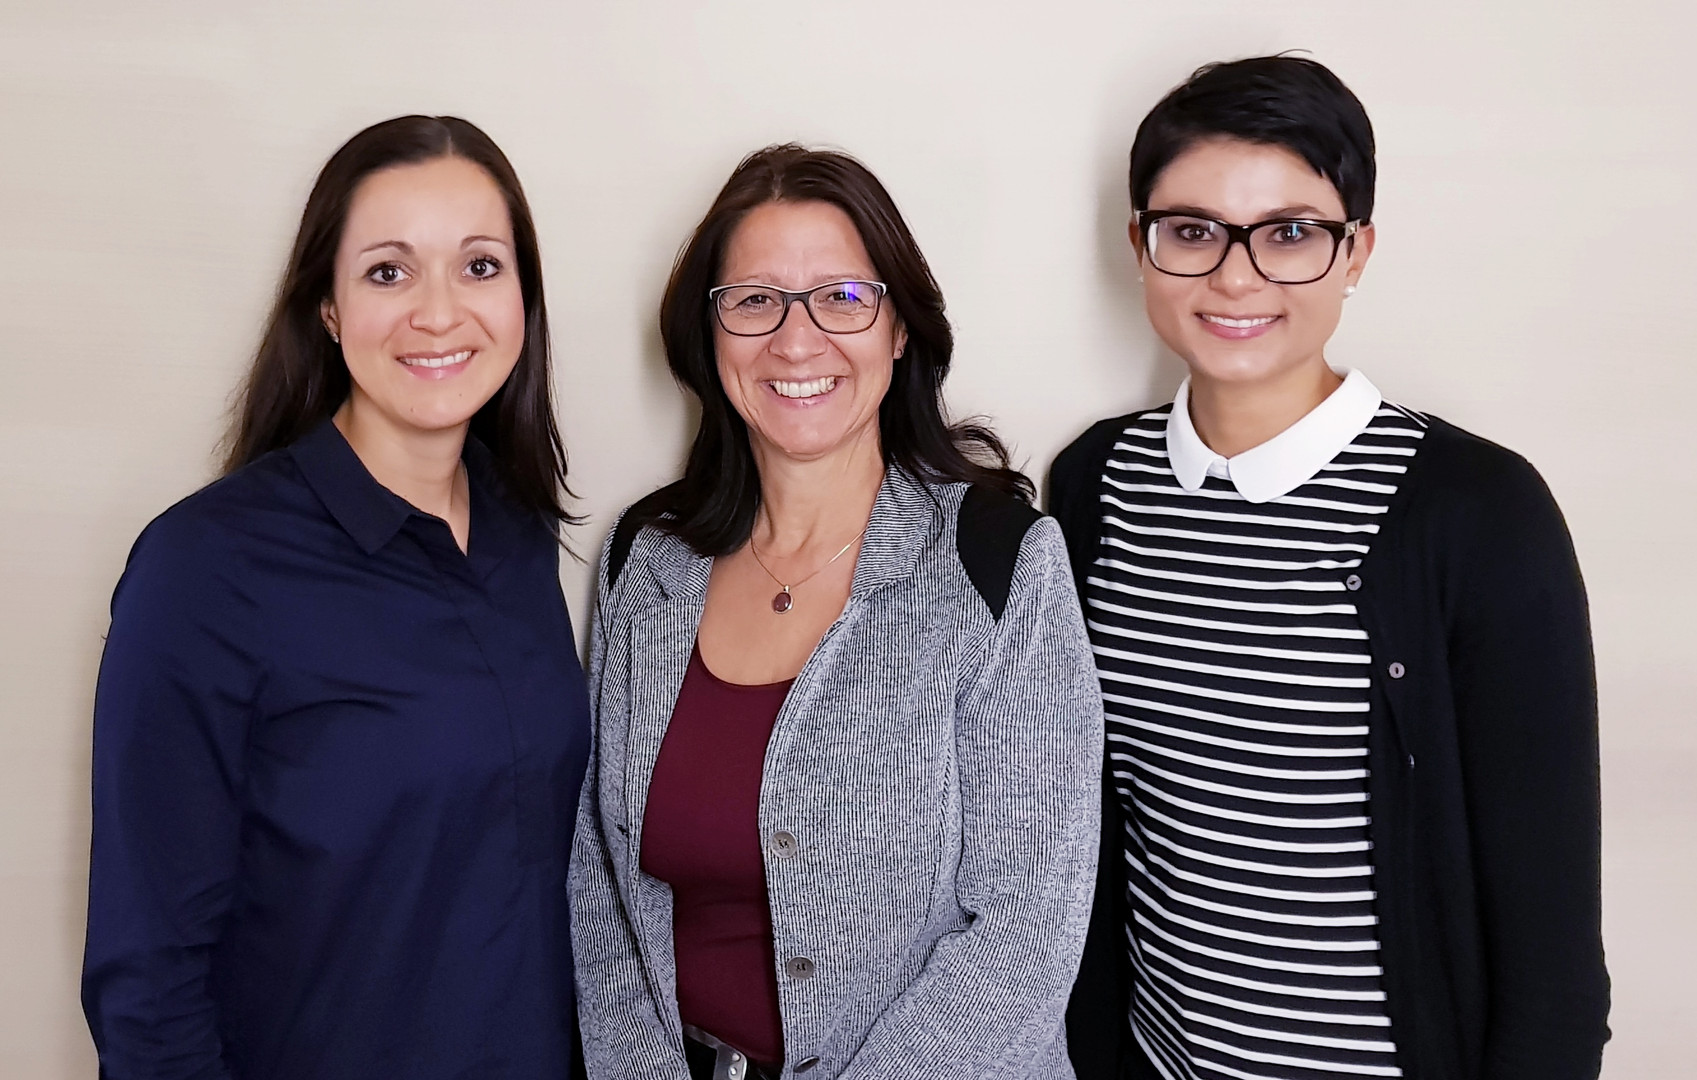 Nadja Perone, Marlène Tinner, Sarah Grabher